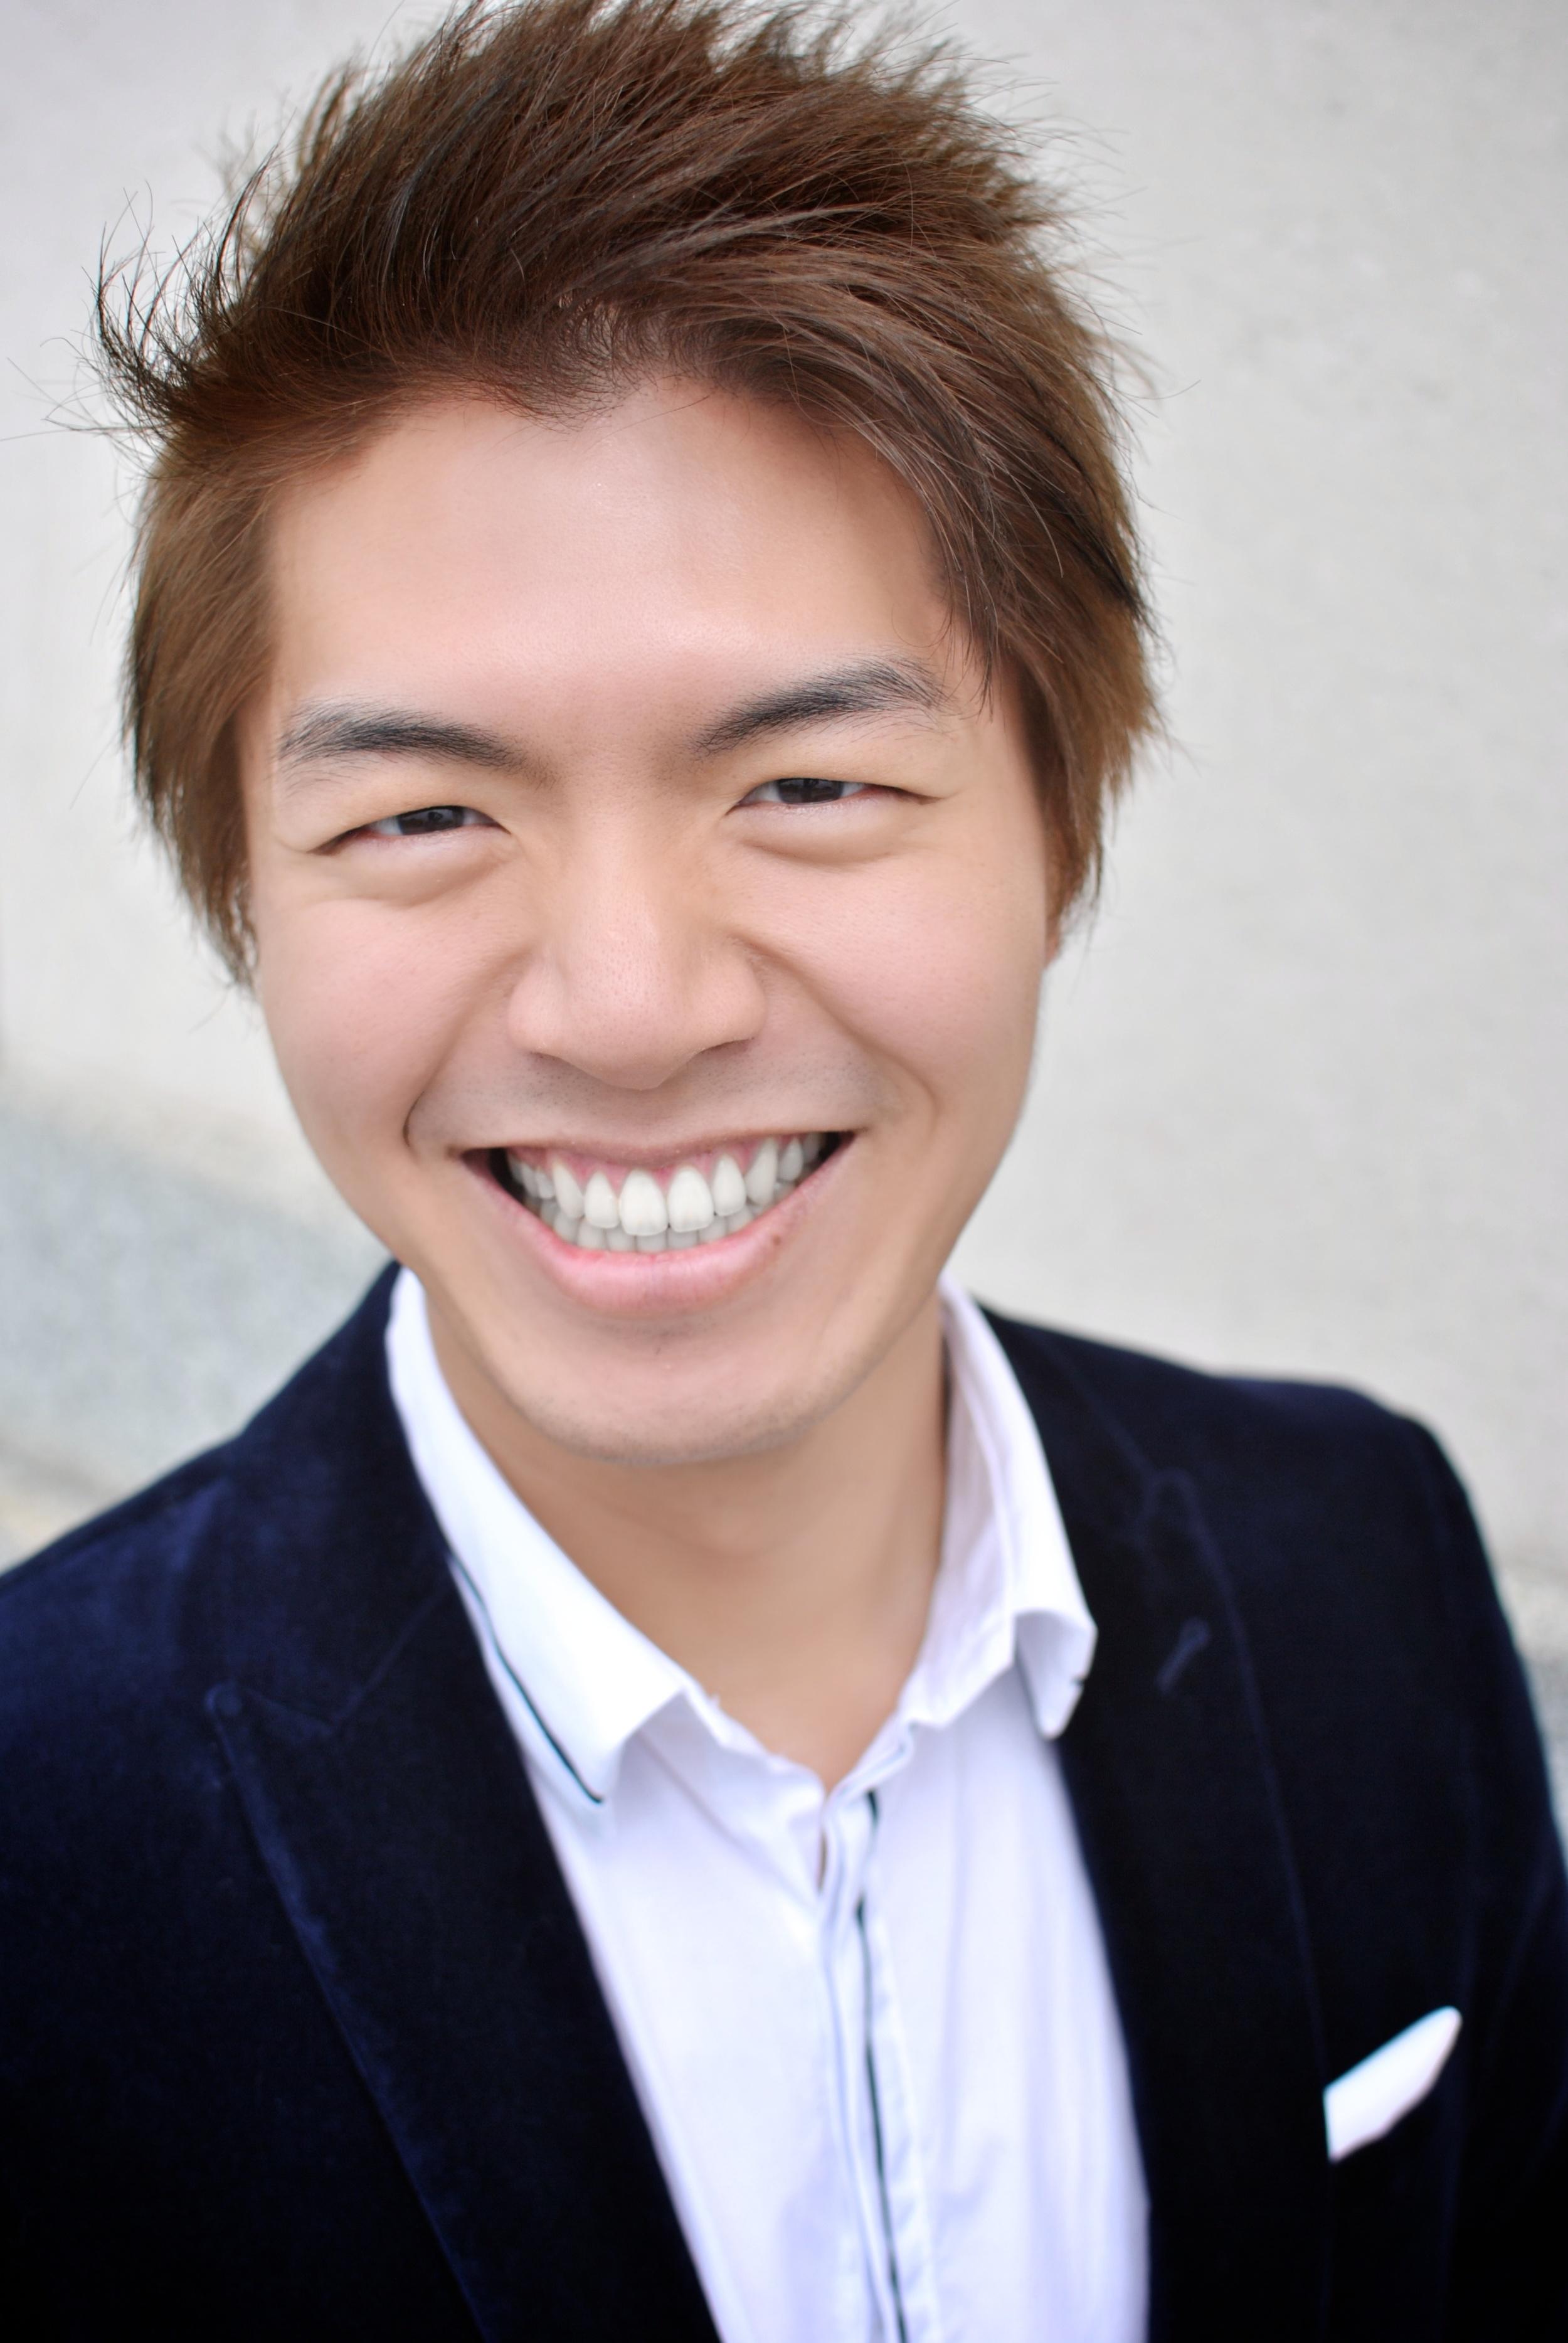 Evans Chuang